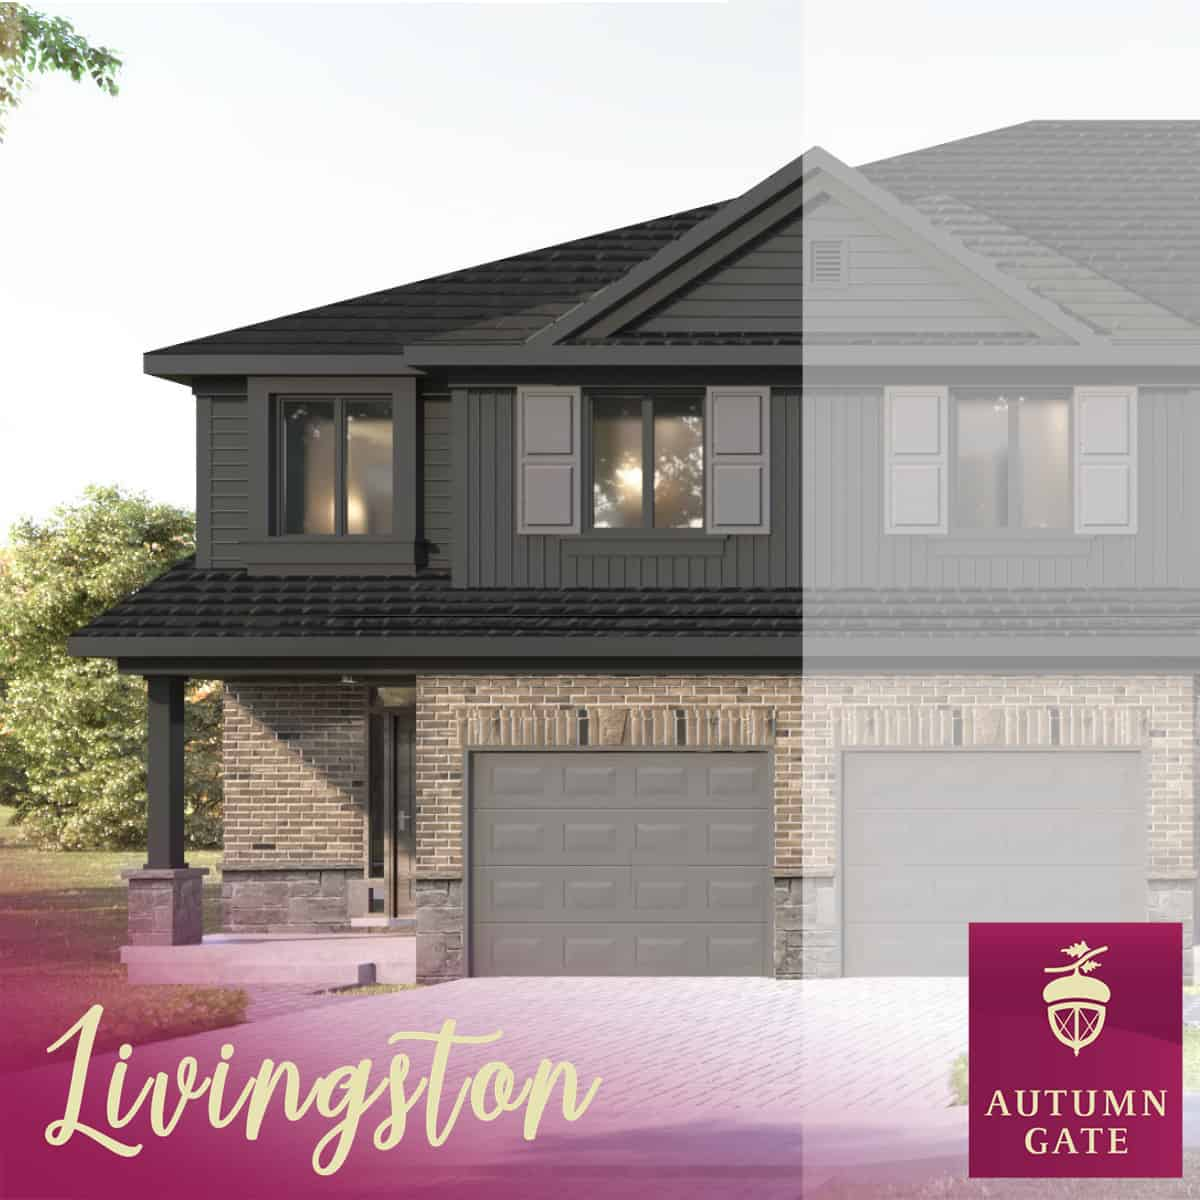 Autumn-Gate-Livingston-Social-Ad